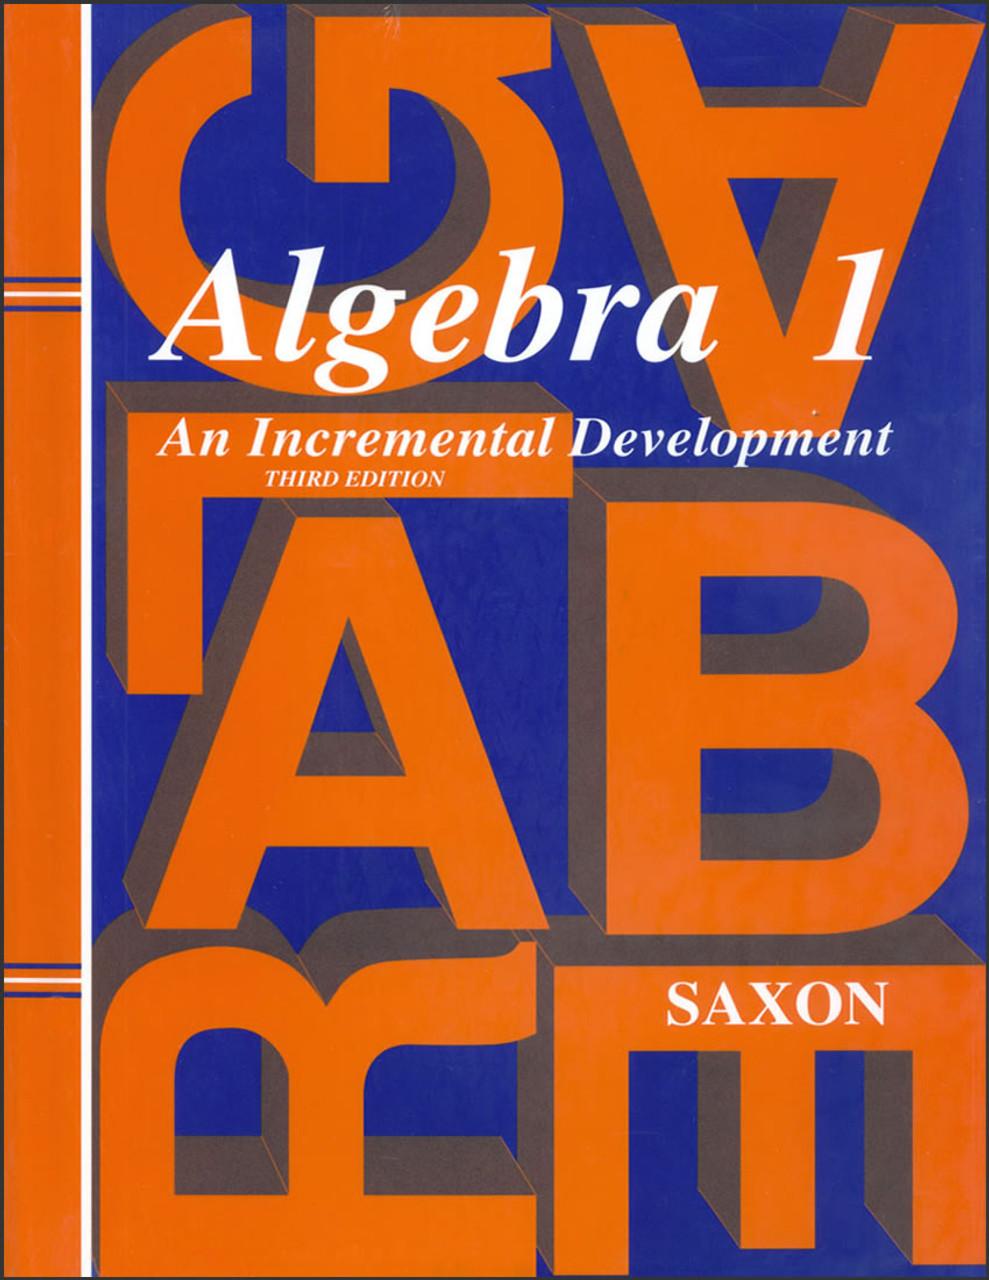 Saxon Algebra 1: An Incremental Development, 3rd edition